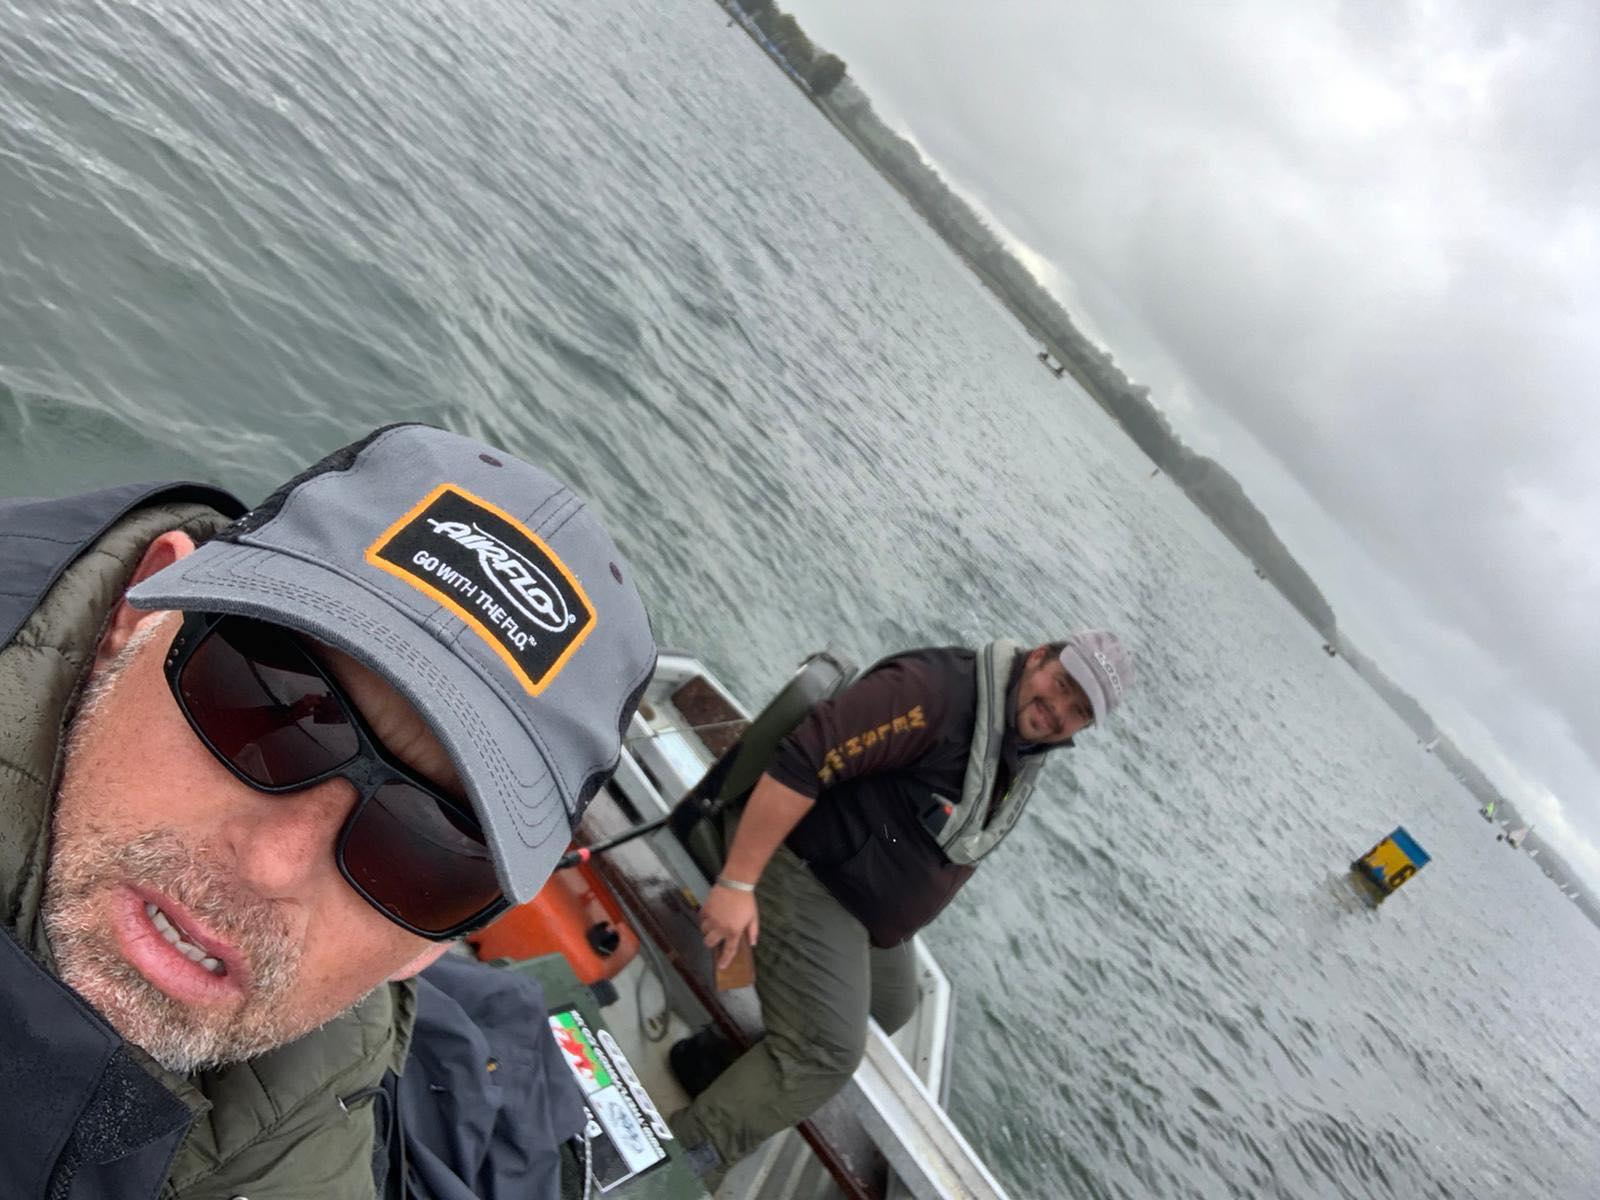 Russ Owen in a boat at Rutland water